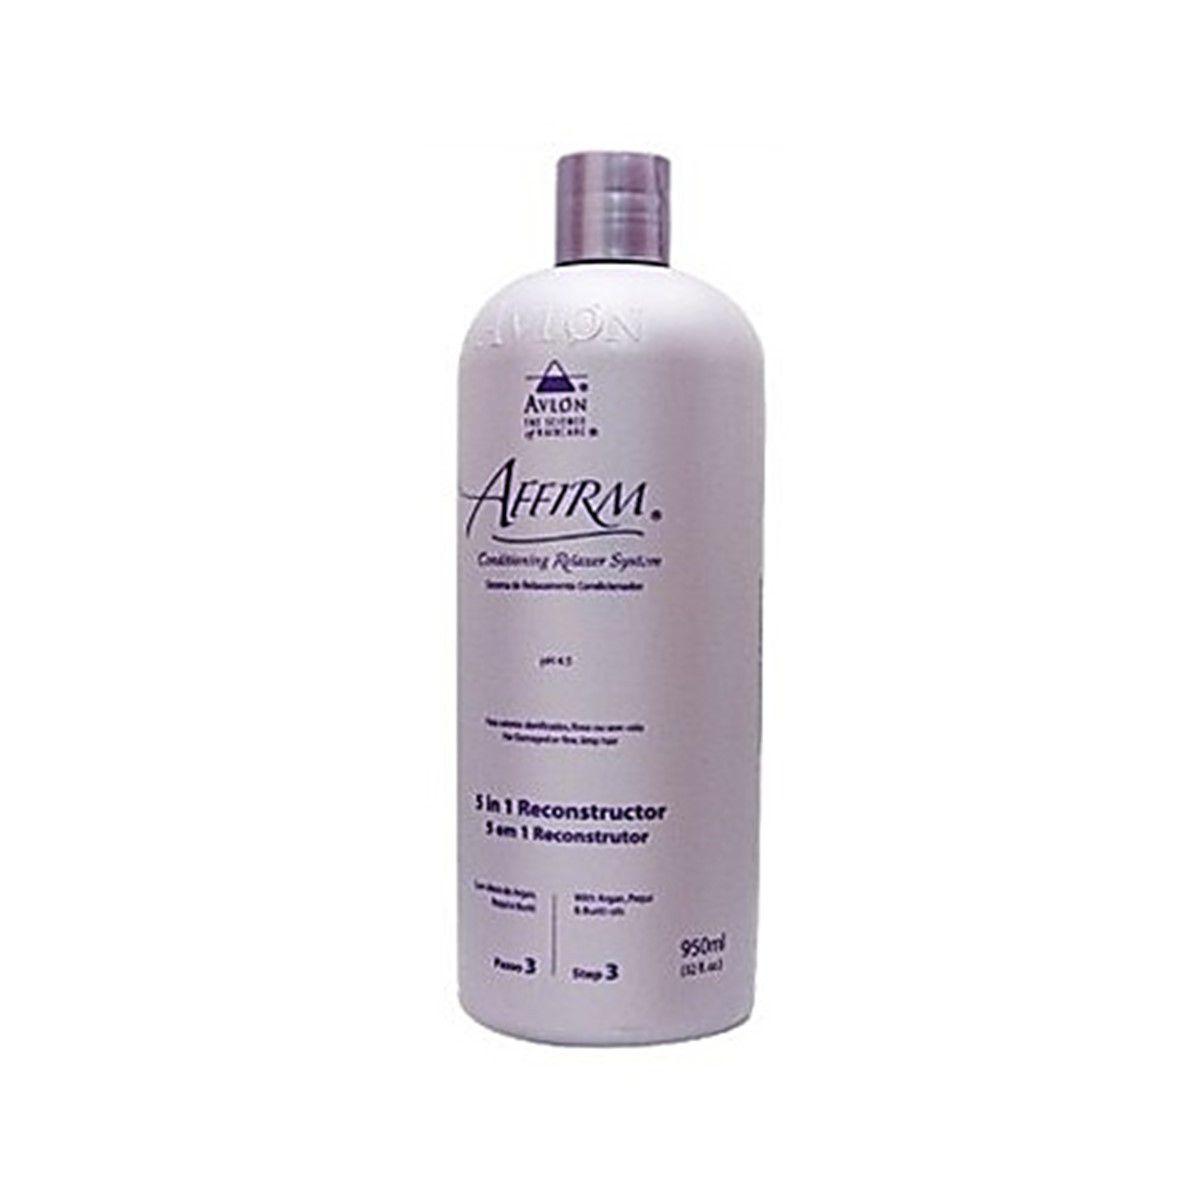 Shampoo Moisture Plus Normalizing Avlon Affirm 950ml - G